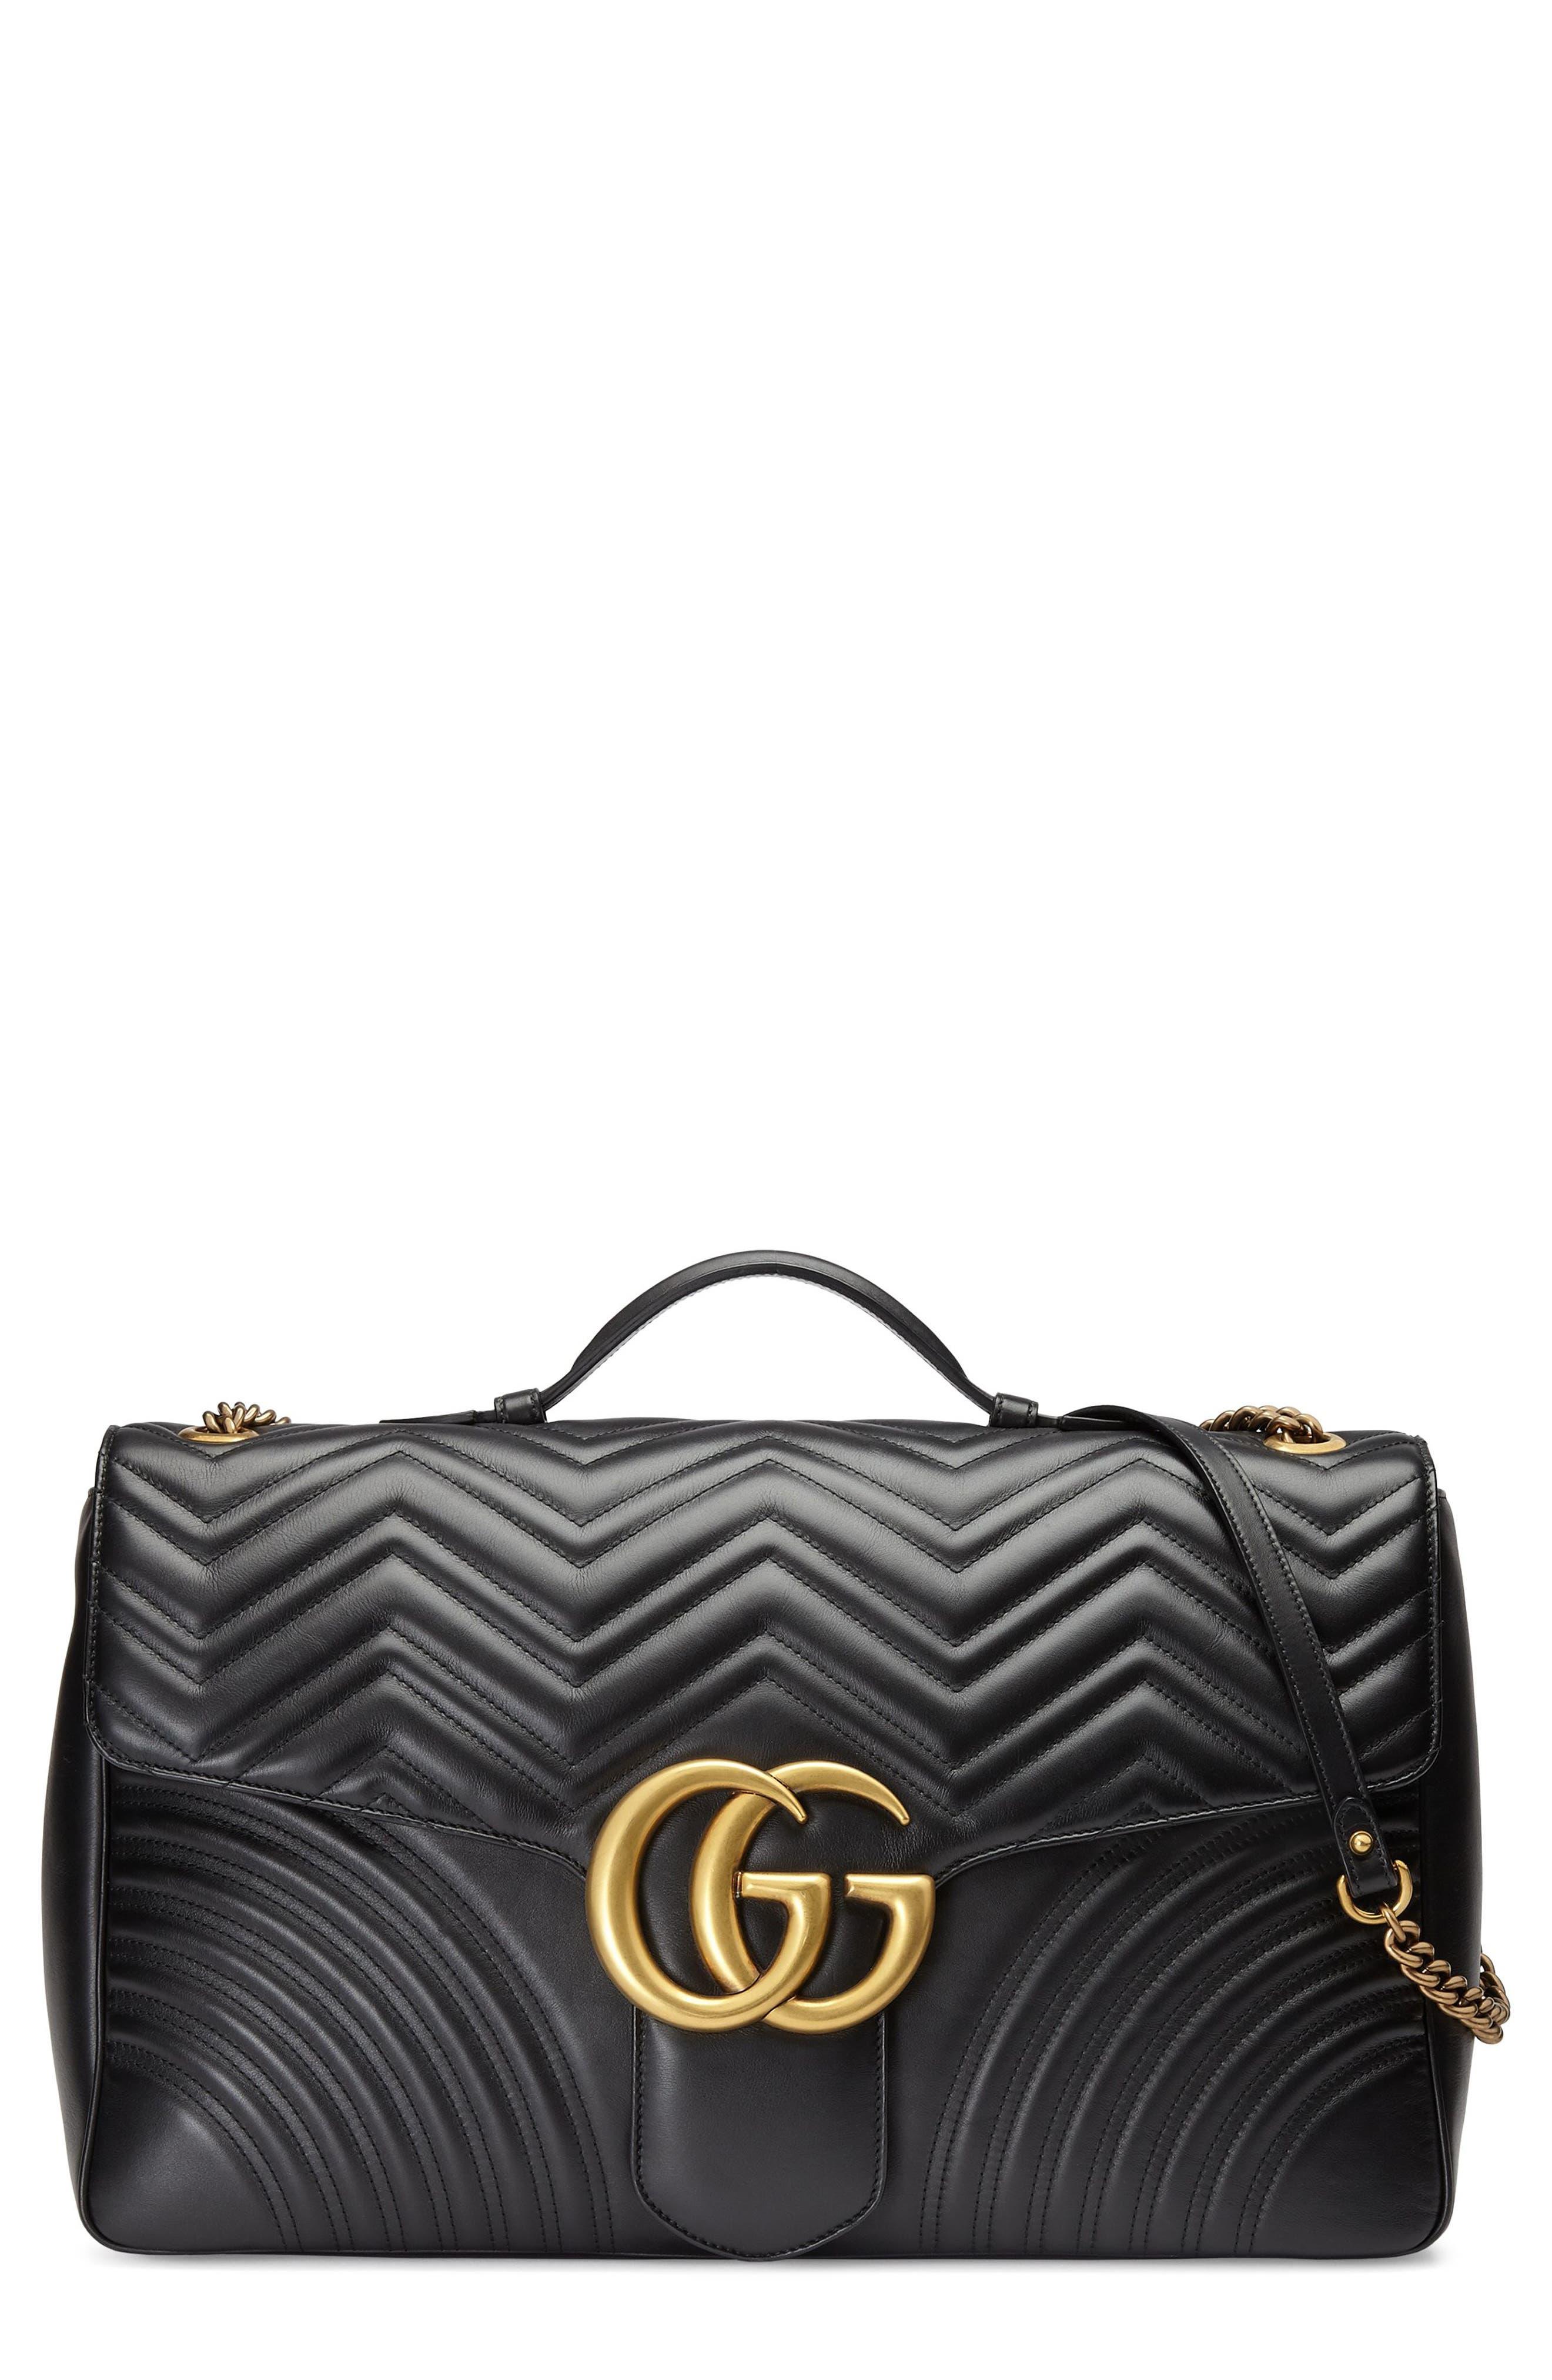 GG Marmont Maxi Matelassé Top Handle Shoulder Bag,                         Main,                         color, 001